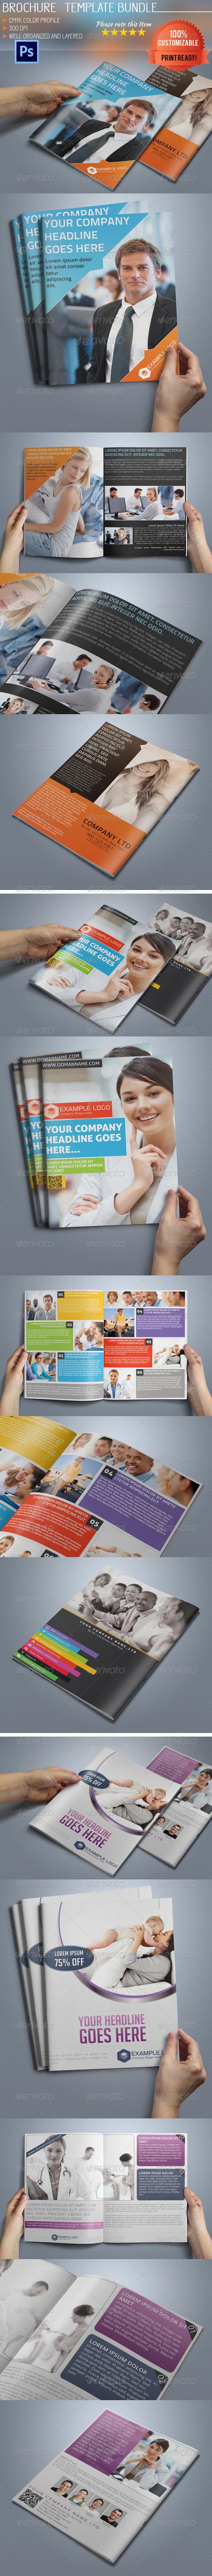 GraphicRiver Multipurpose Bi-Fold Business Brochure Bundle 01 5130271